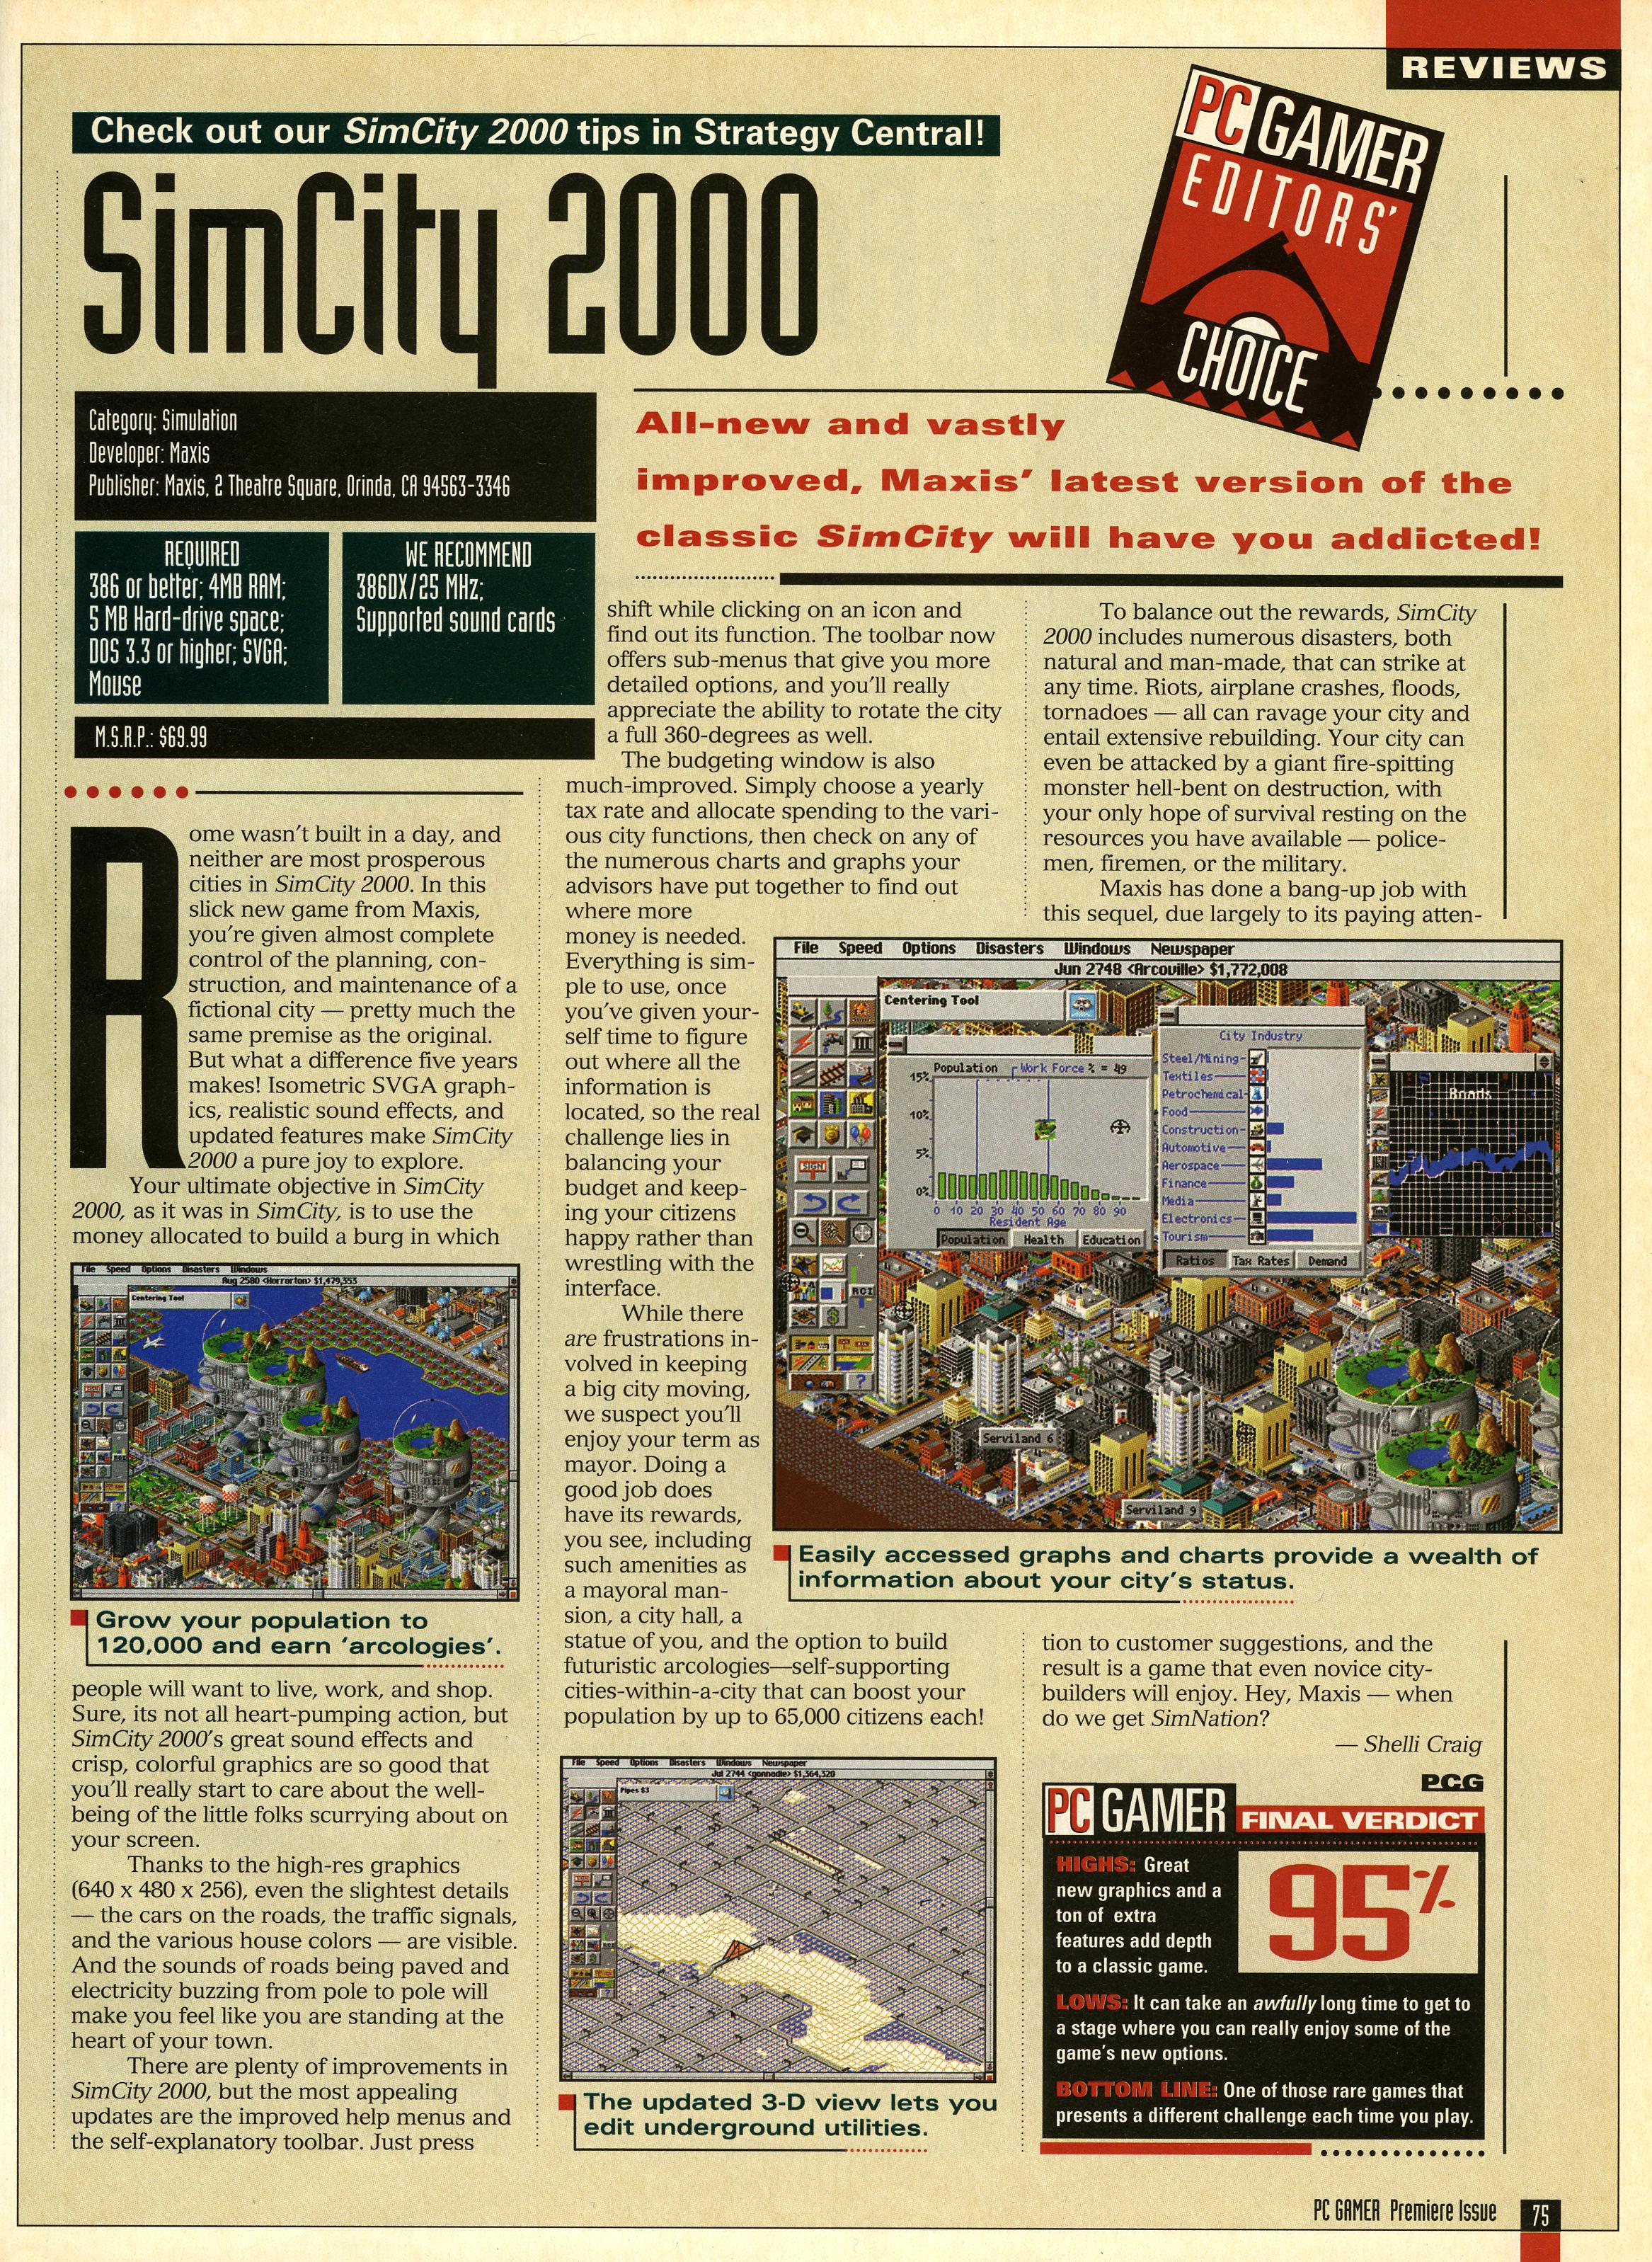 May 1994 Pc Gamer Reviews Simcity 2000 Pc Gamer